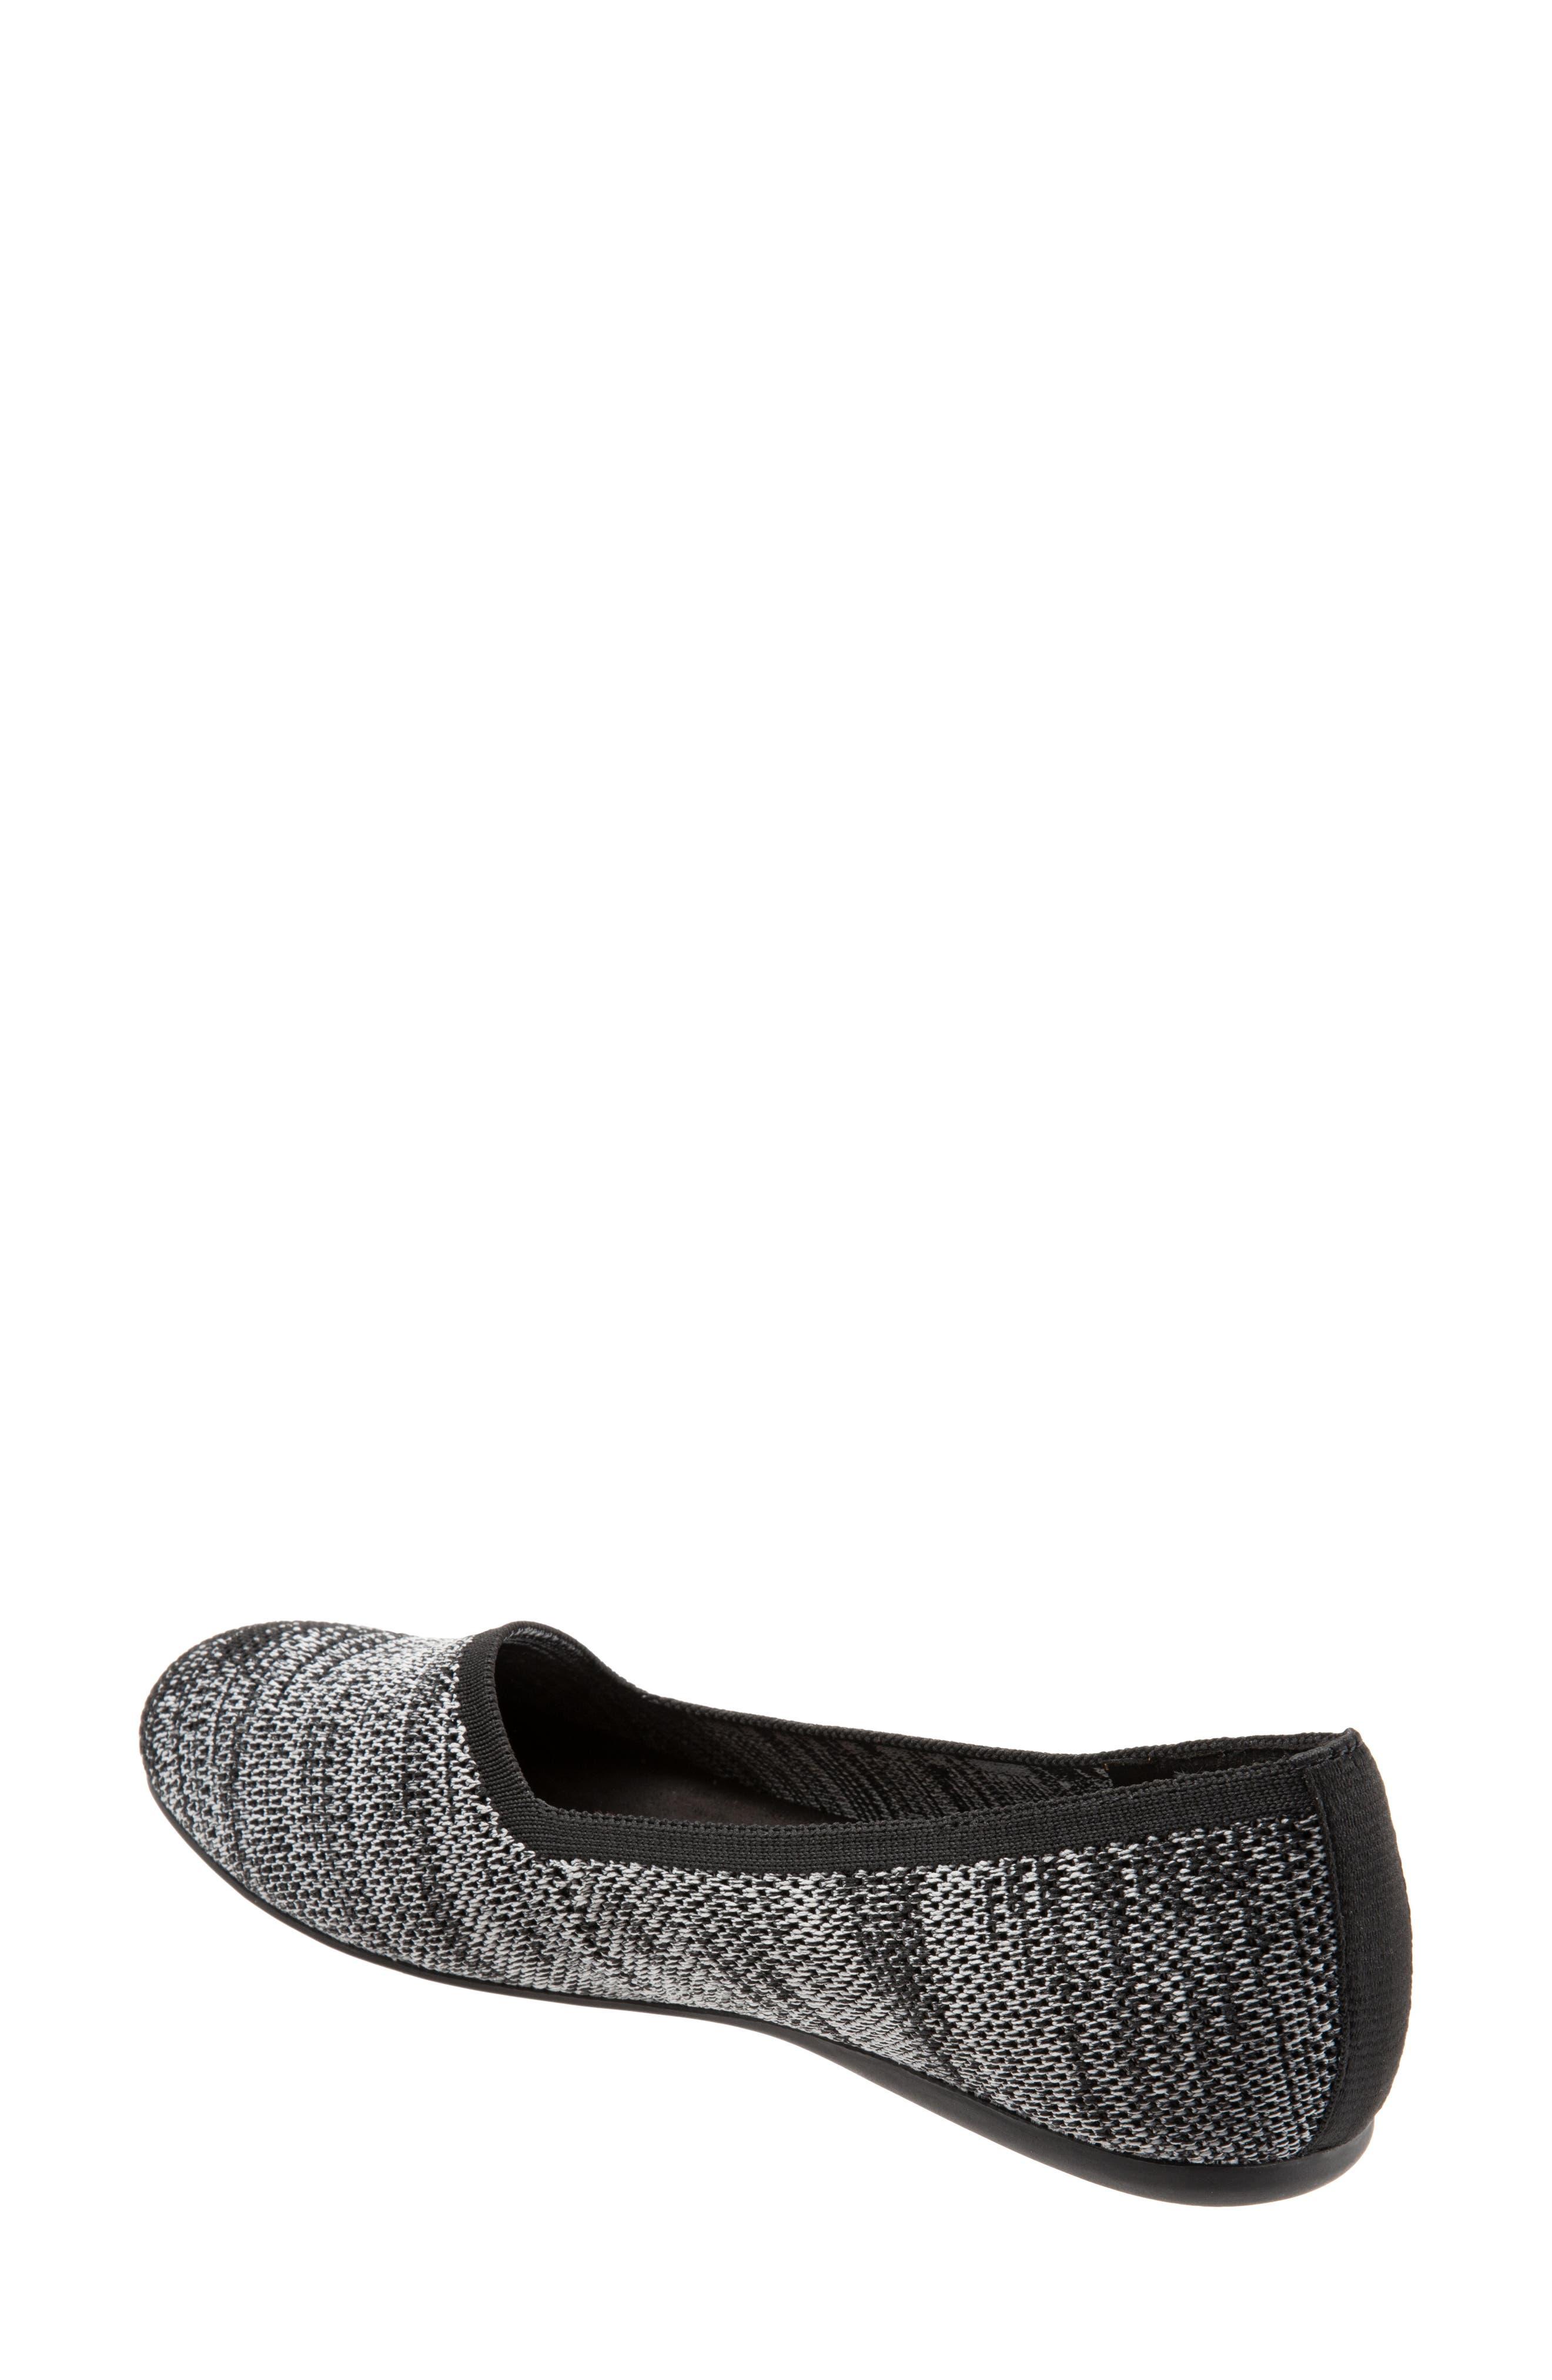 Sicily Knit Flat,                             Alternate thumbnail 2, color,                             BLACK KNIT FABRIC